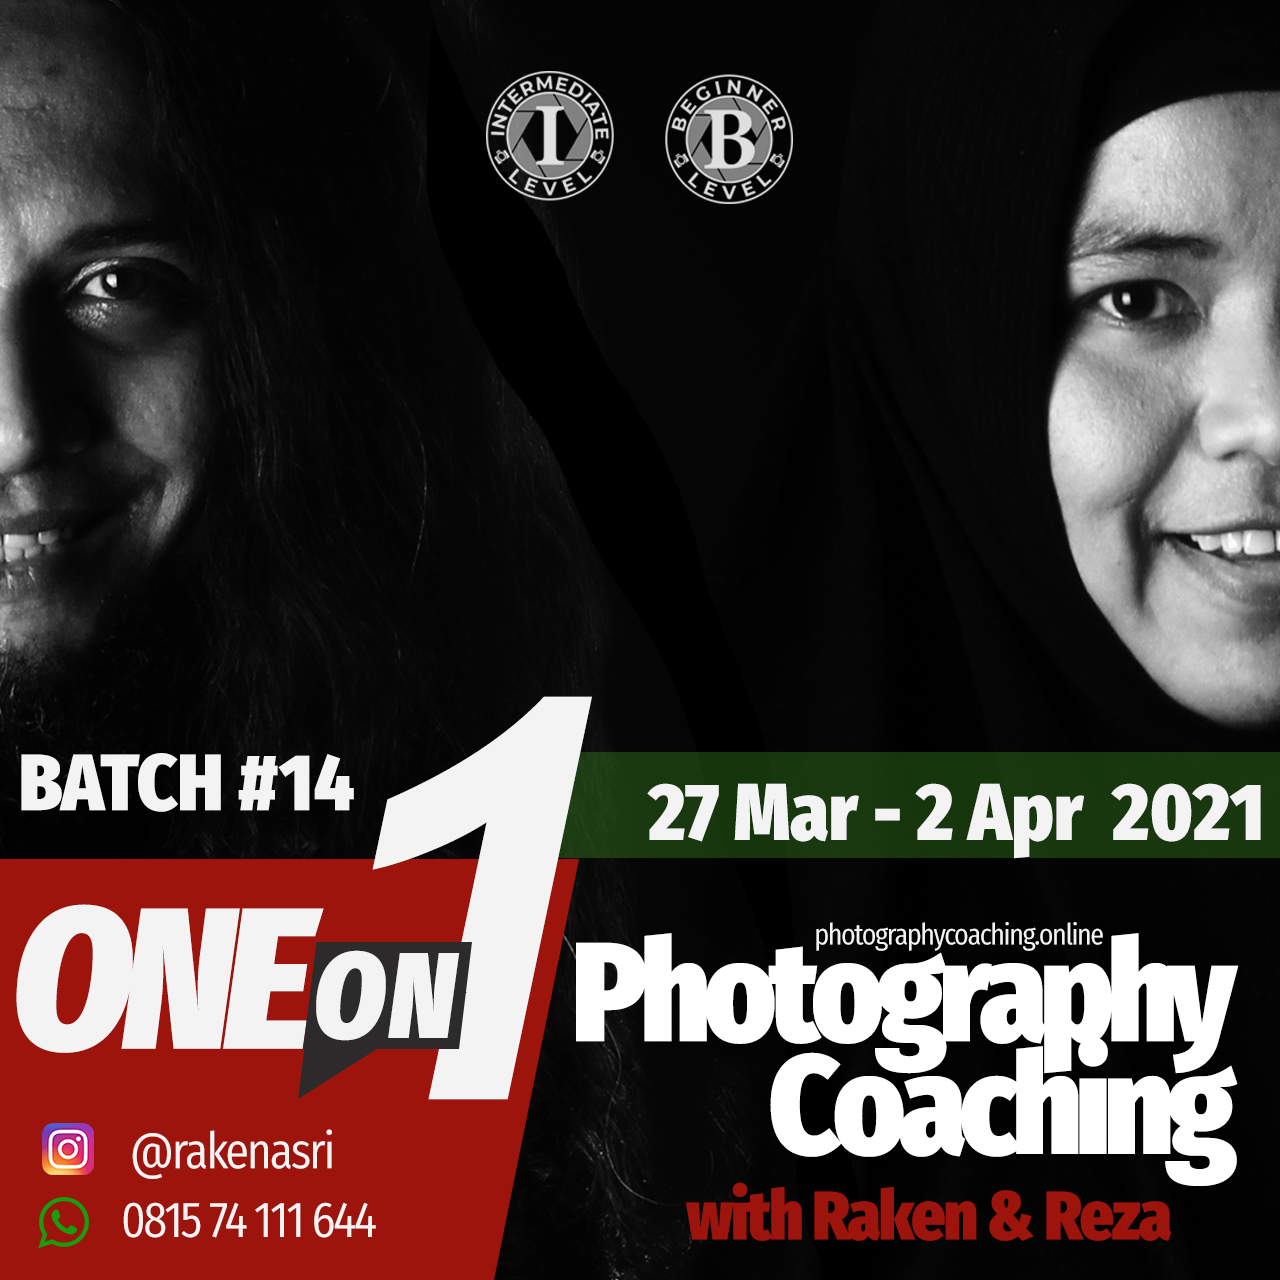 Raken Reza Photography